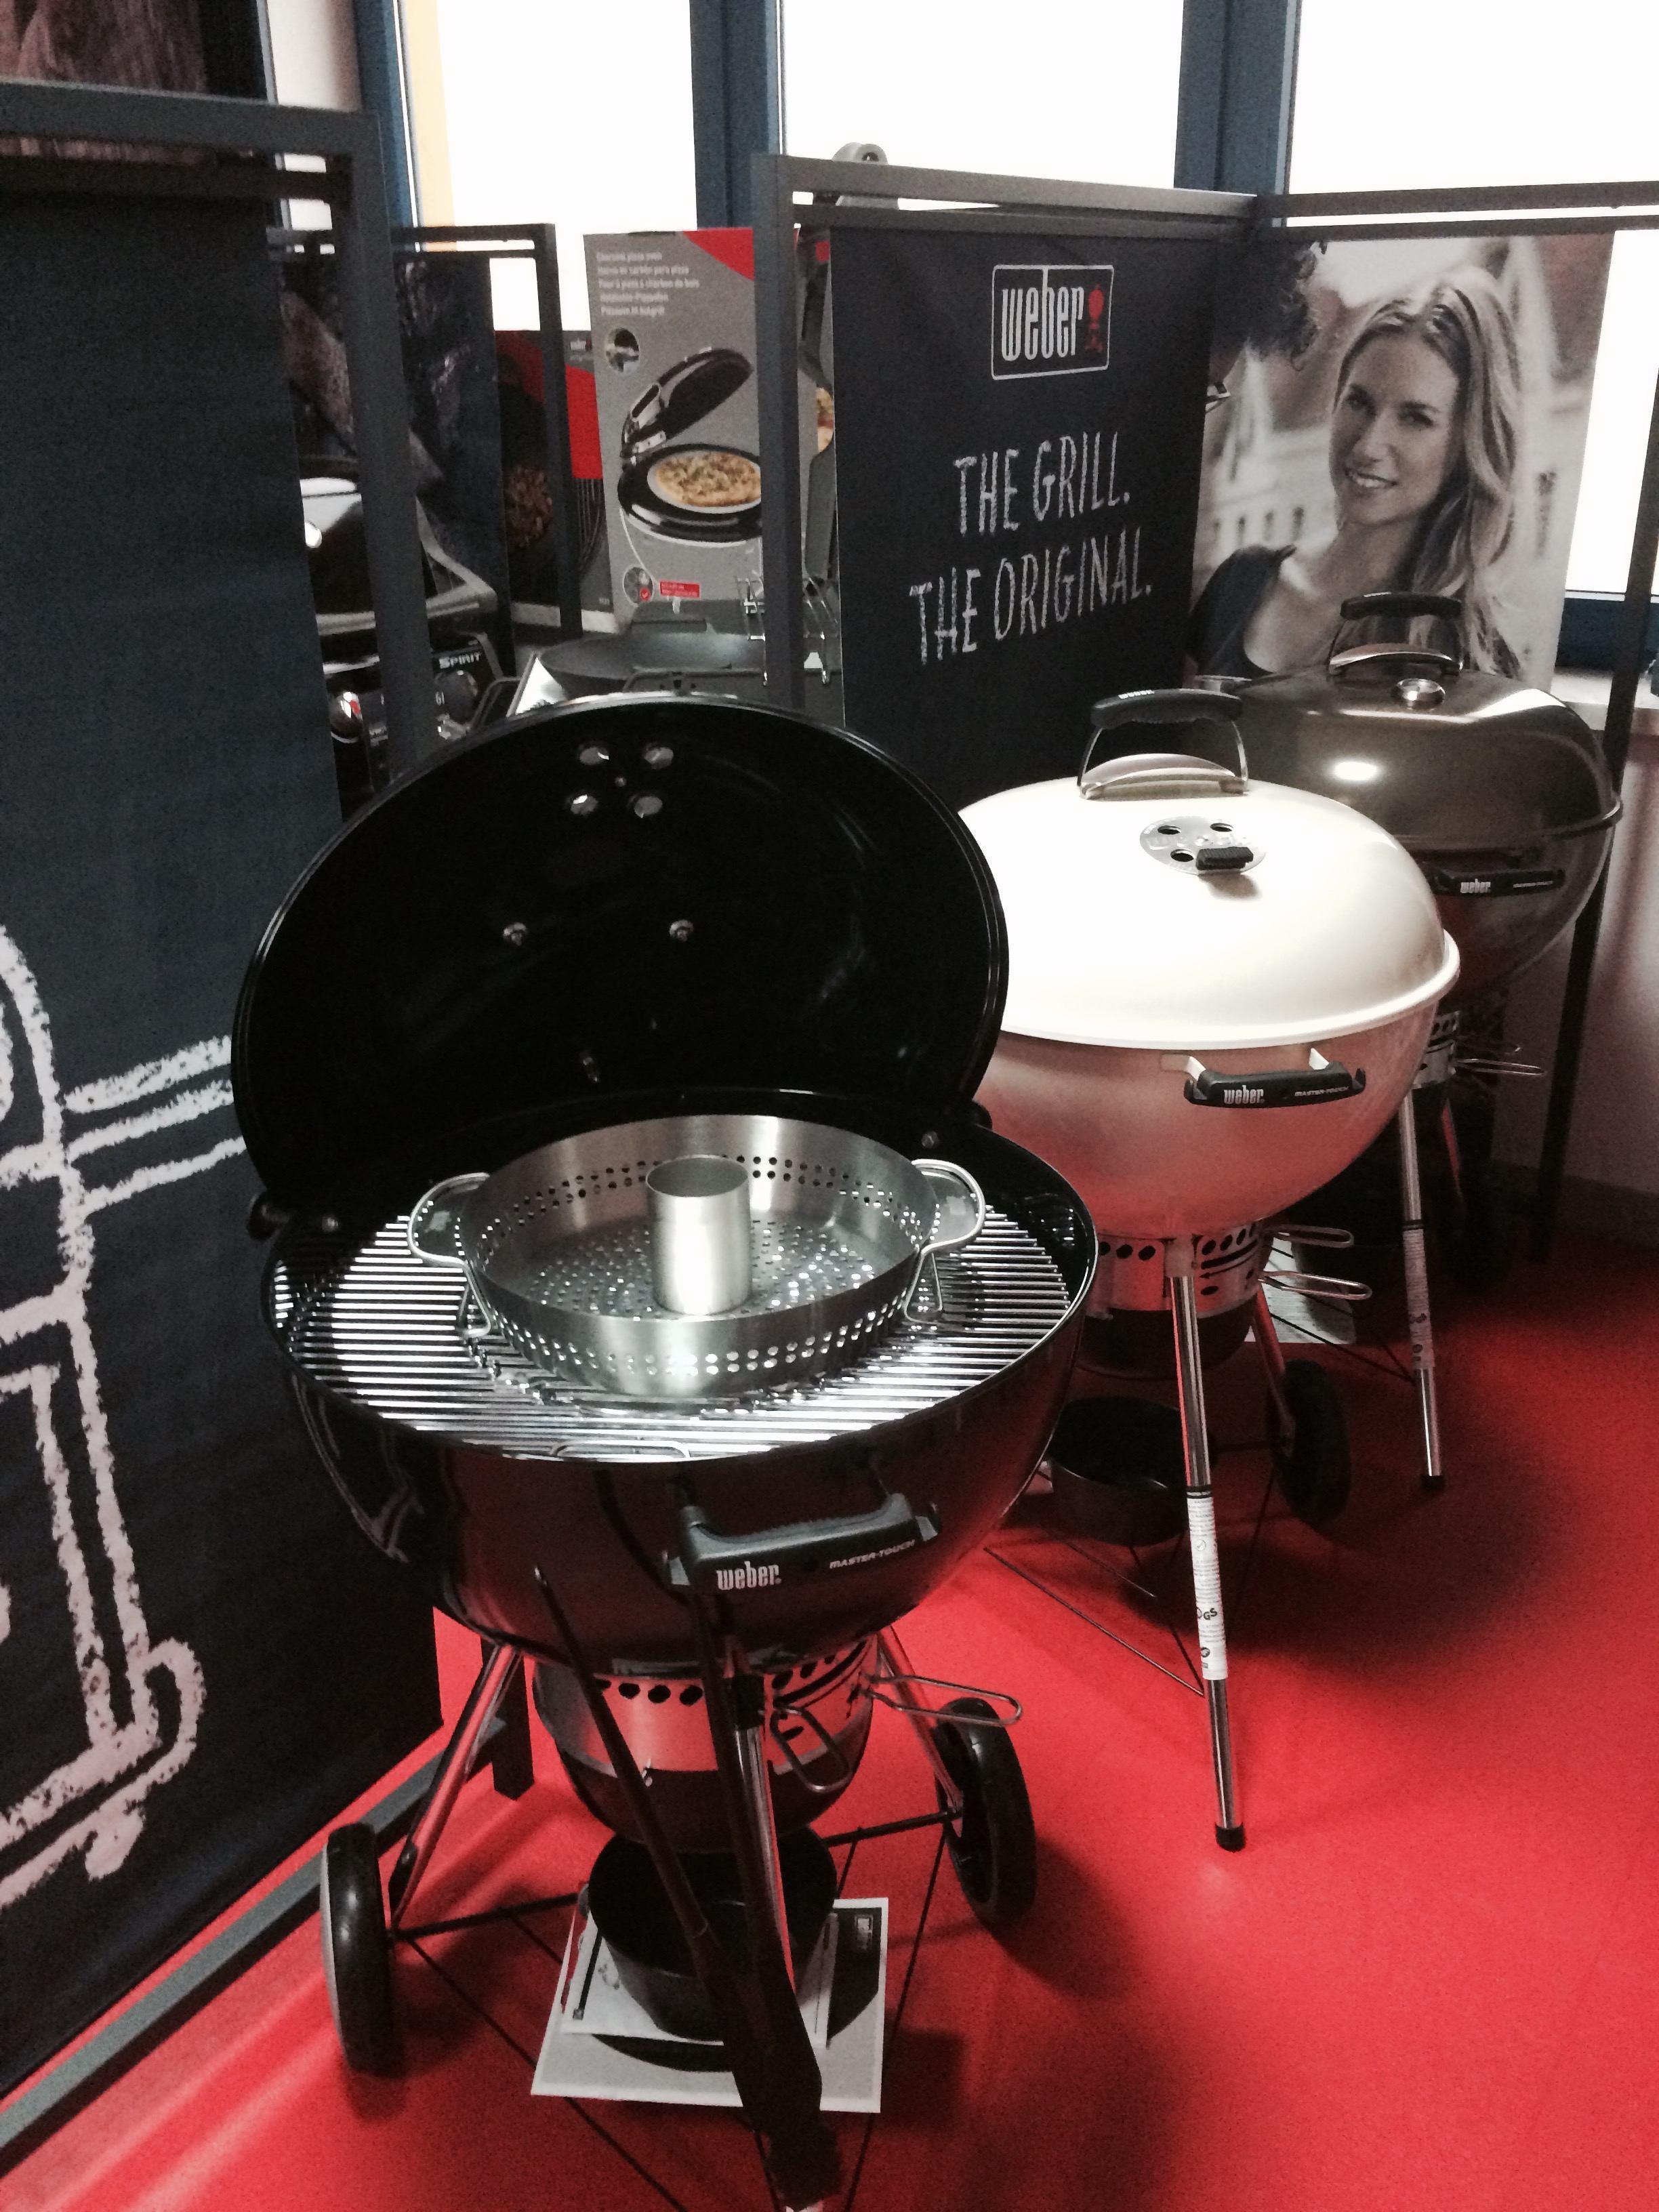 decofire-grill-weber-w-polsce-6